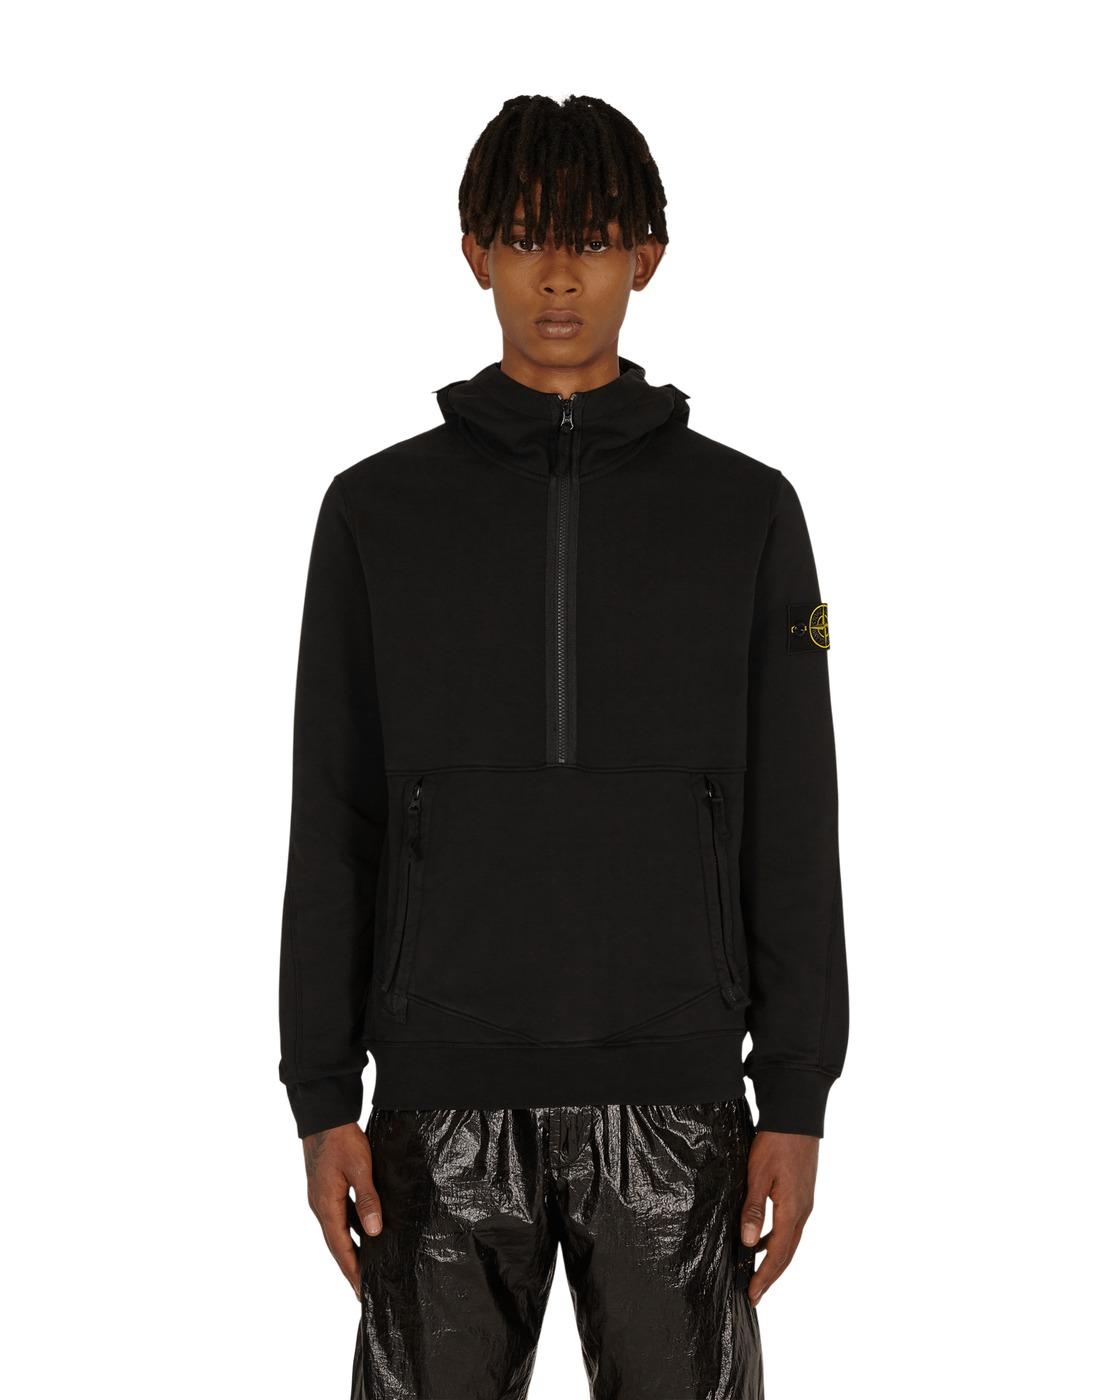 Photo: Stone Island Classic Half Zip Hooded Sweatshirt Black